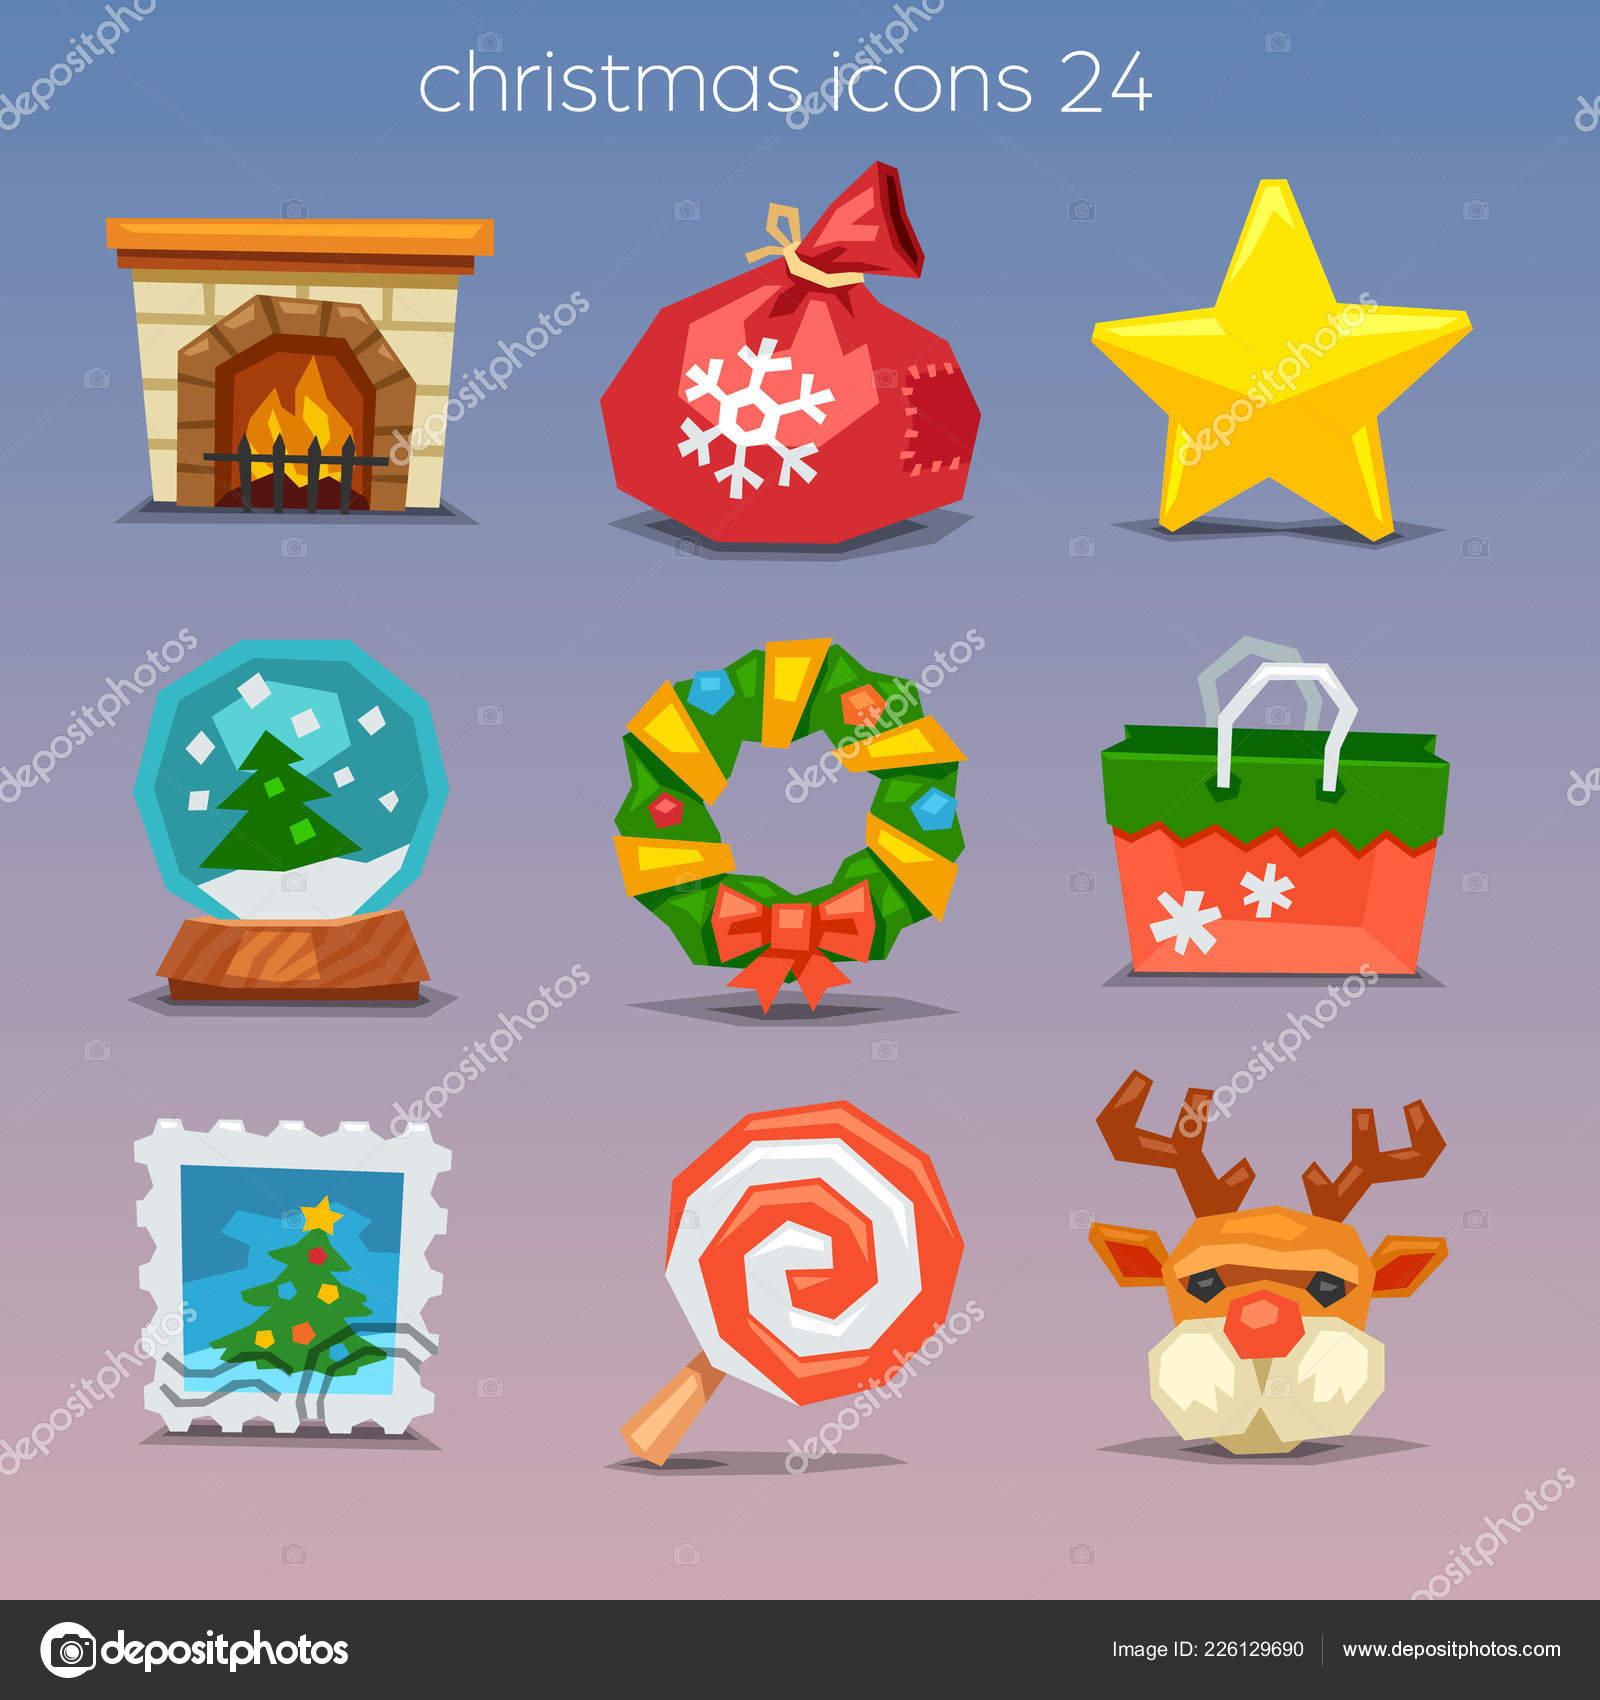 Funny Merry Christmas Icons Set — Stock Vector © Kolopach #226129690